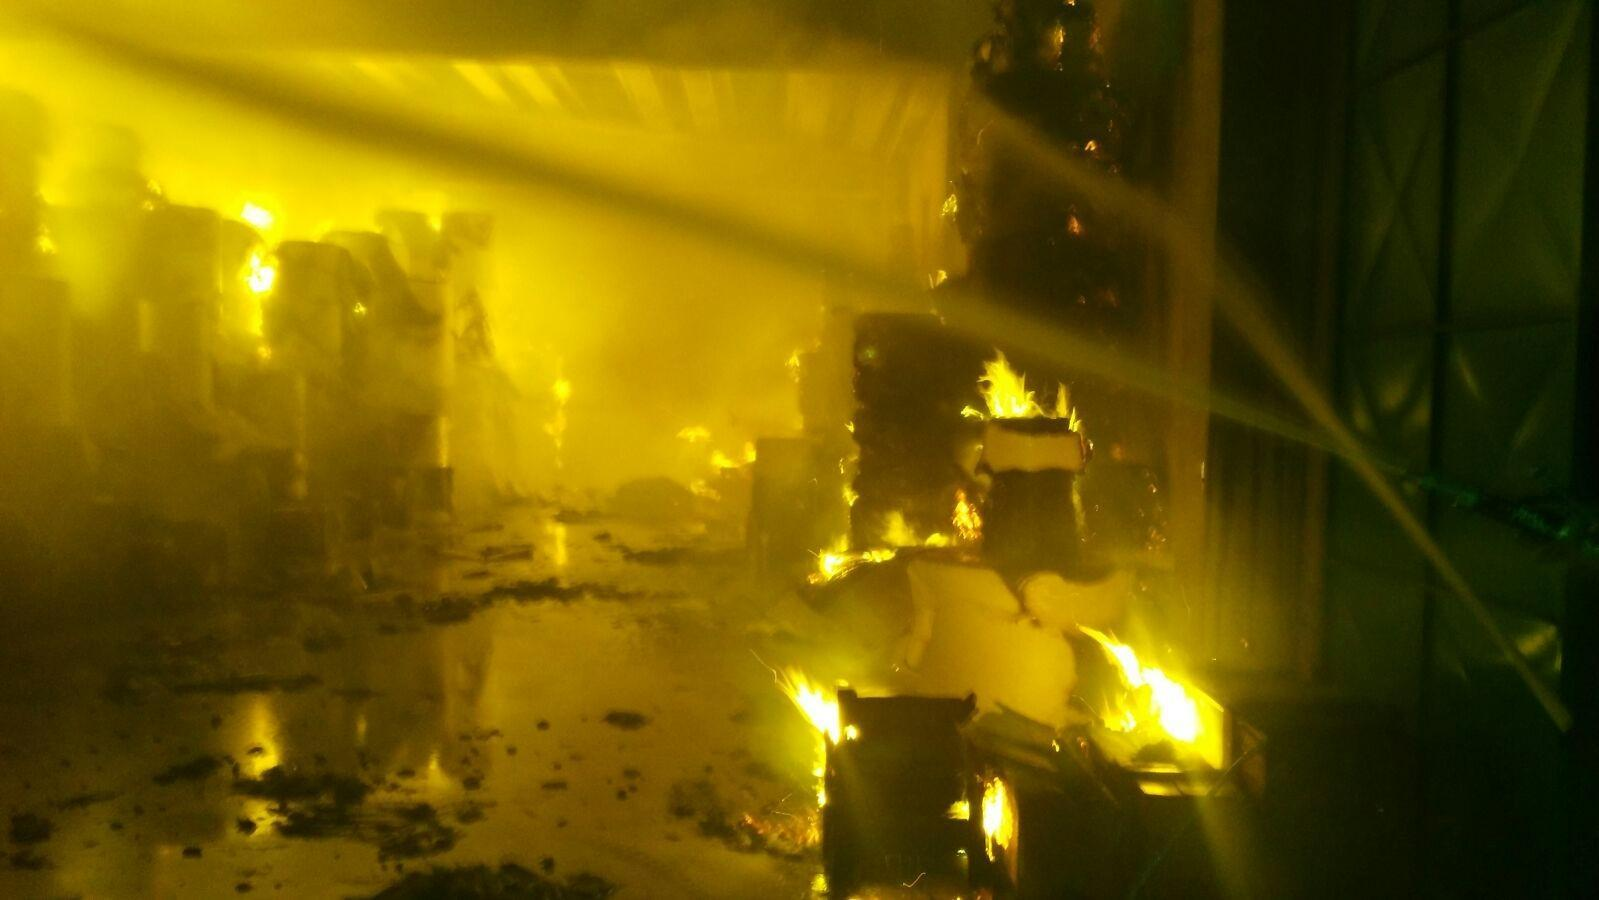 Pomezia, incendio via Pontina Vecchia: il sindaco rassicura i cittadini